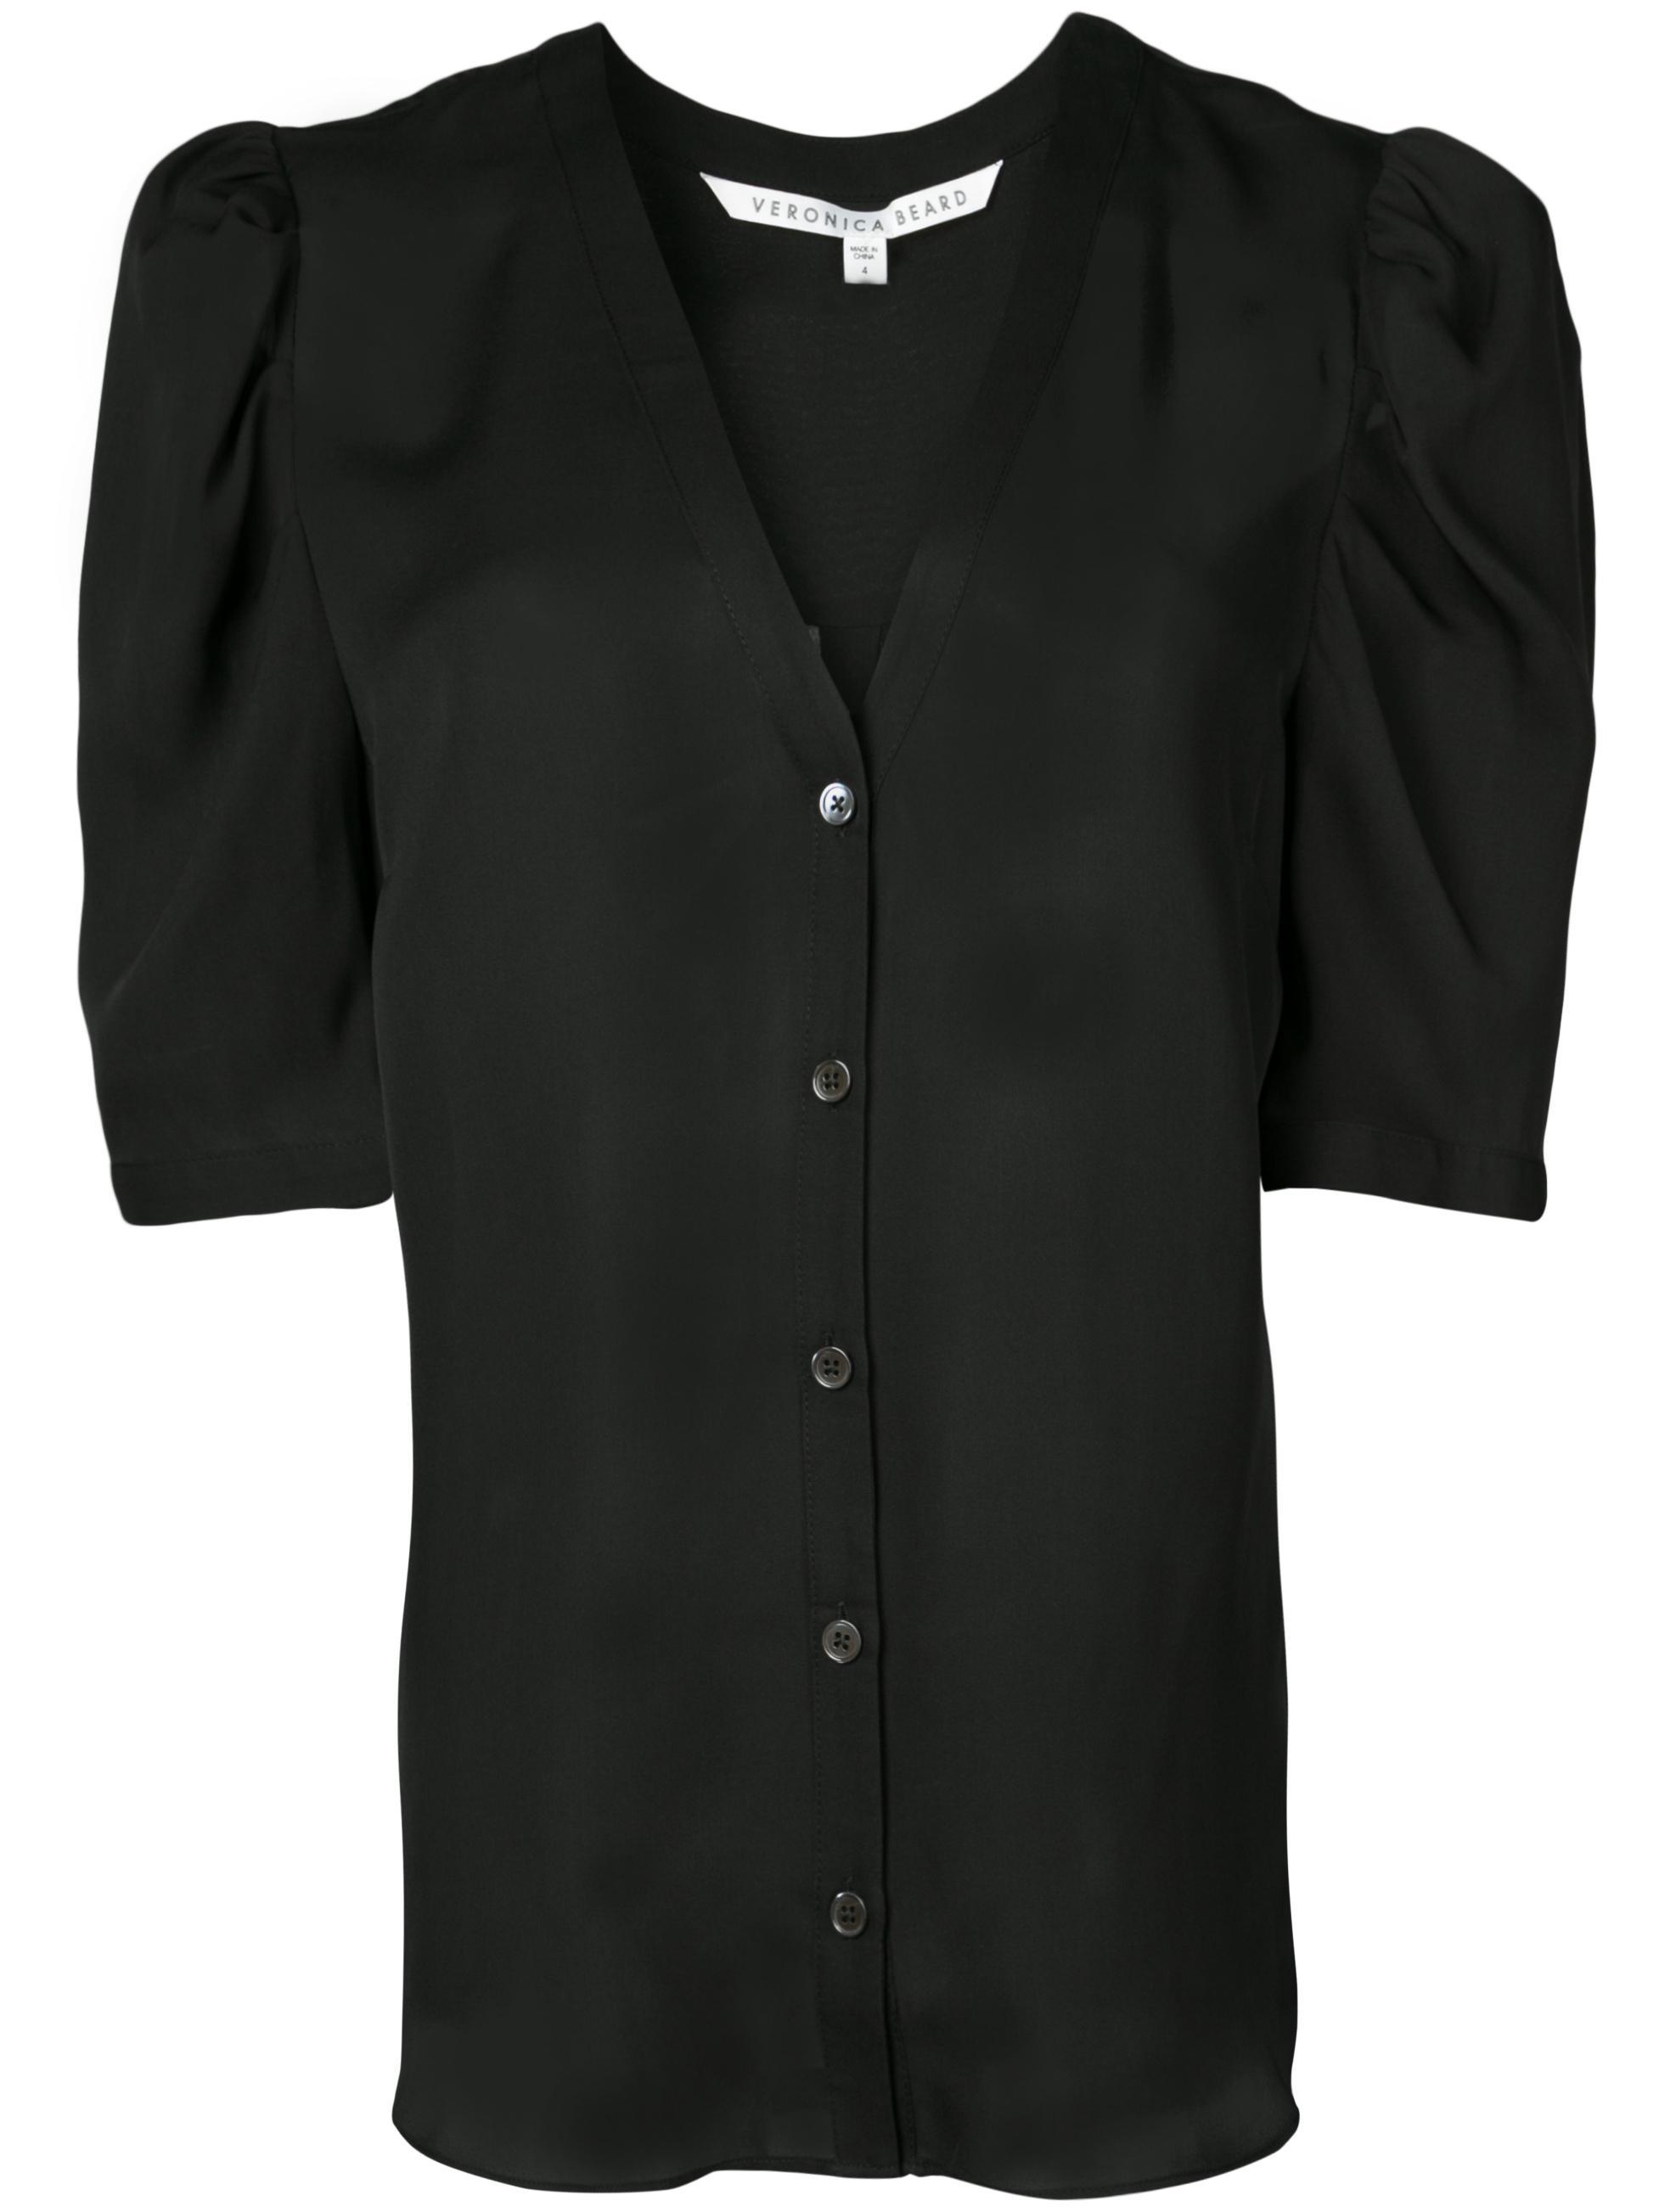 Garland Short Sleeve V- Neck Button Up Blouse Item # 1905GGT054574